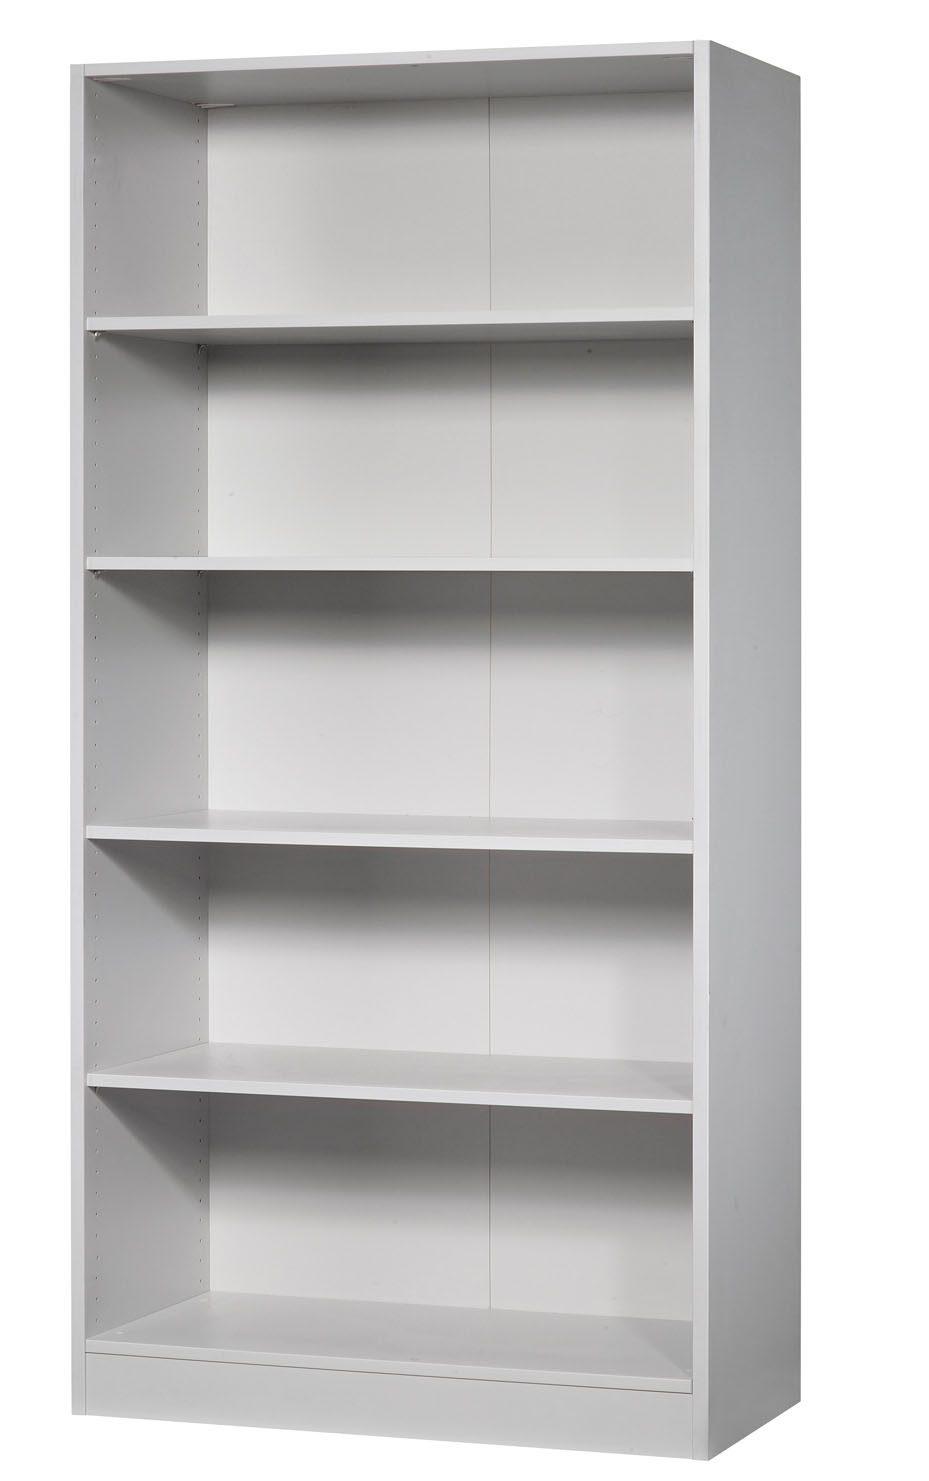 regalschrank design interessante ideen f r. Black Bedroom Furniture Sets. Home Design Ideas